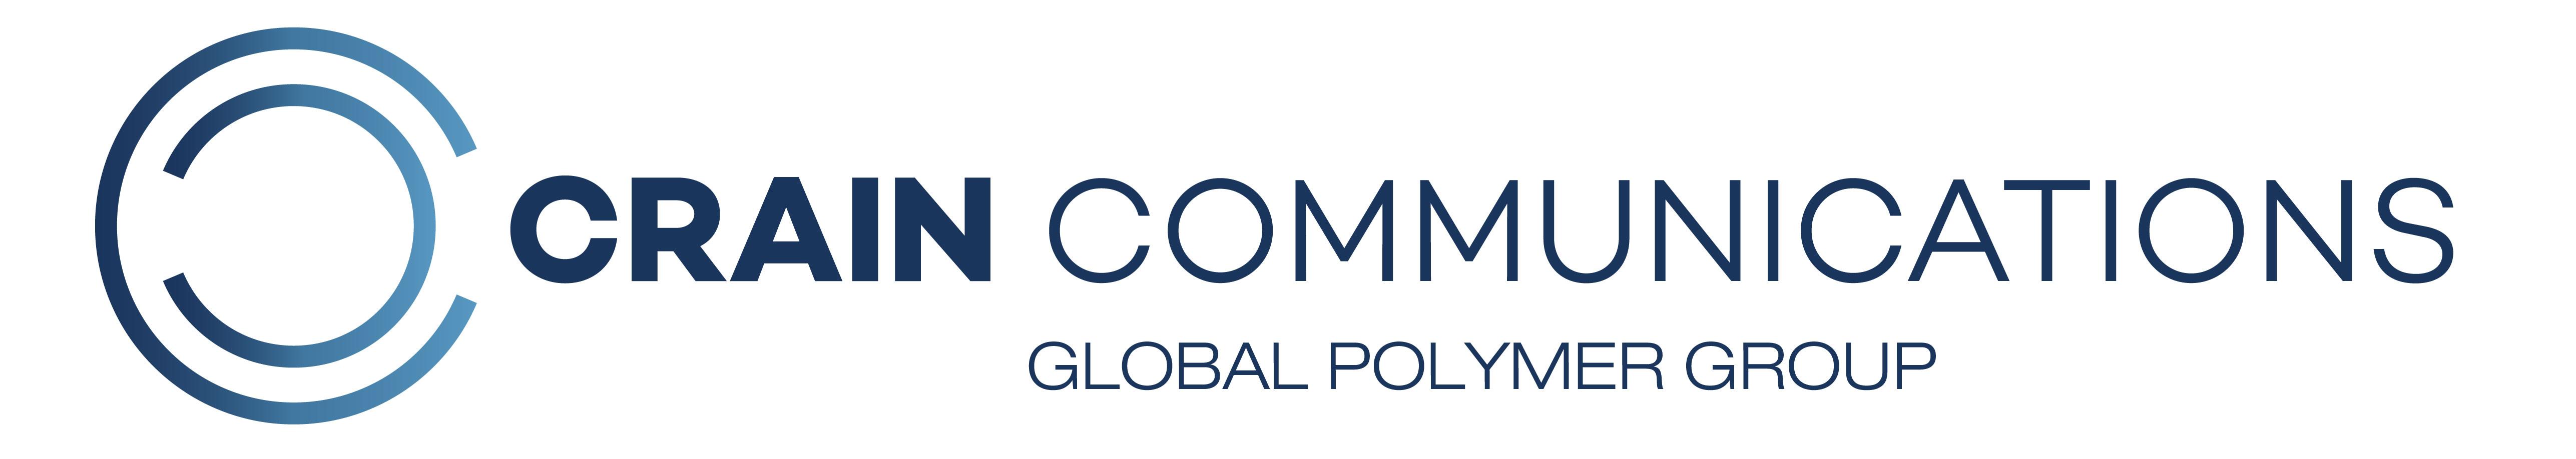 Crain-GlobalPolymerGroup-horiz